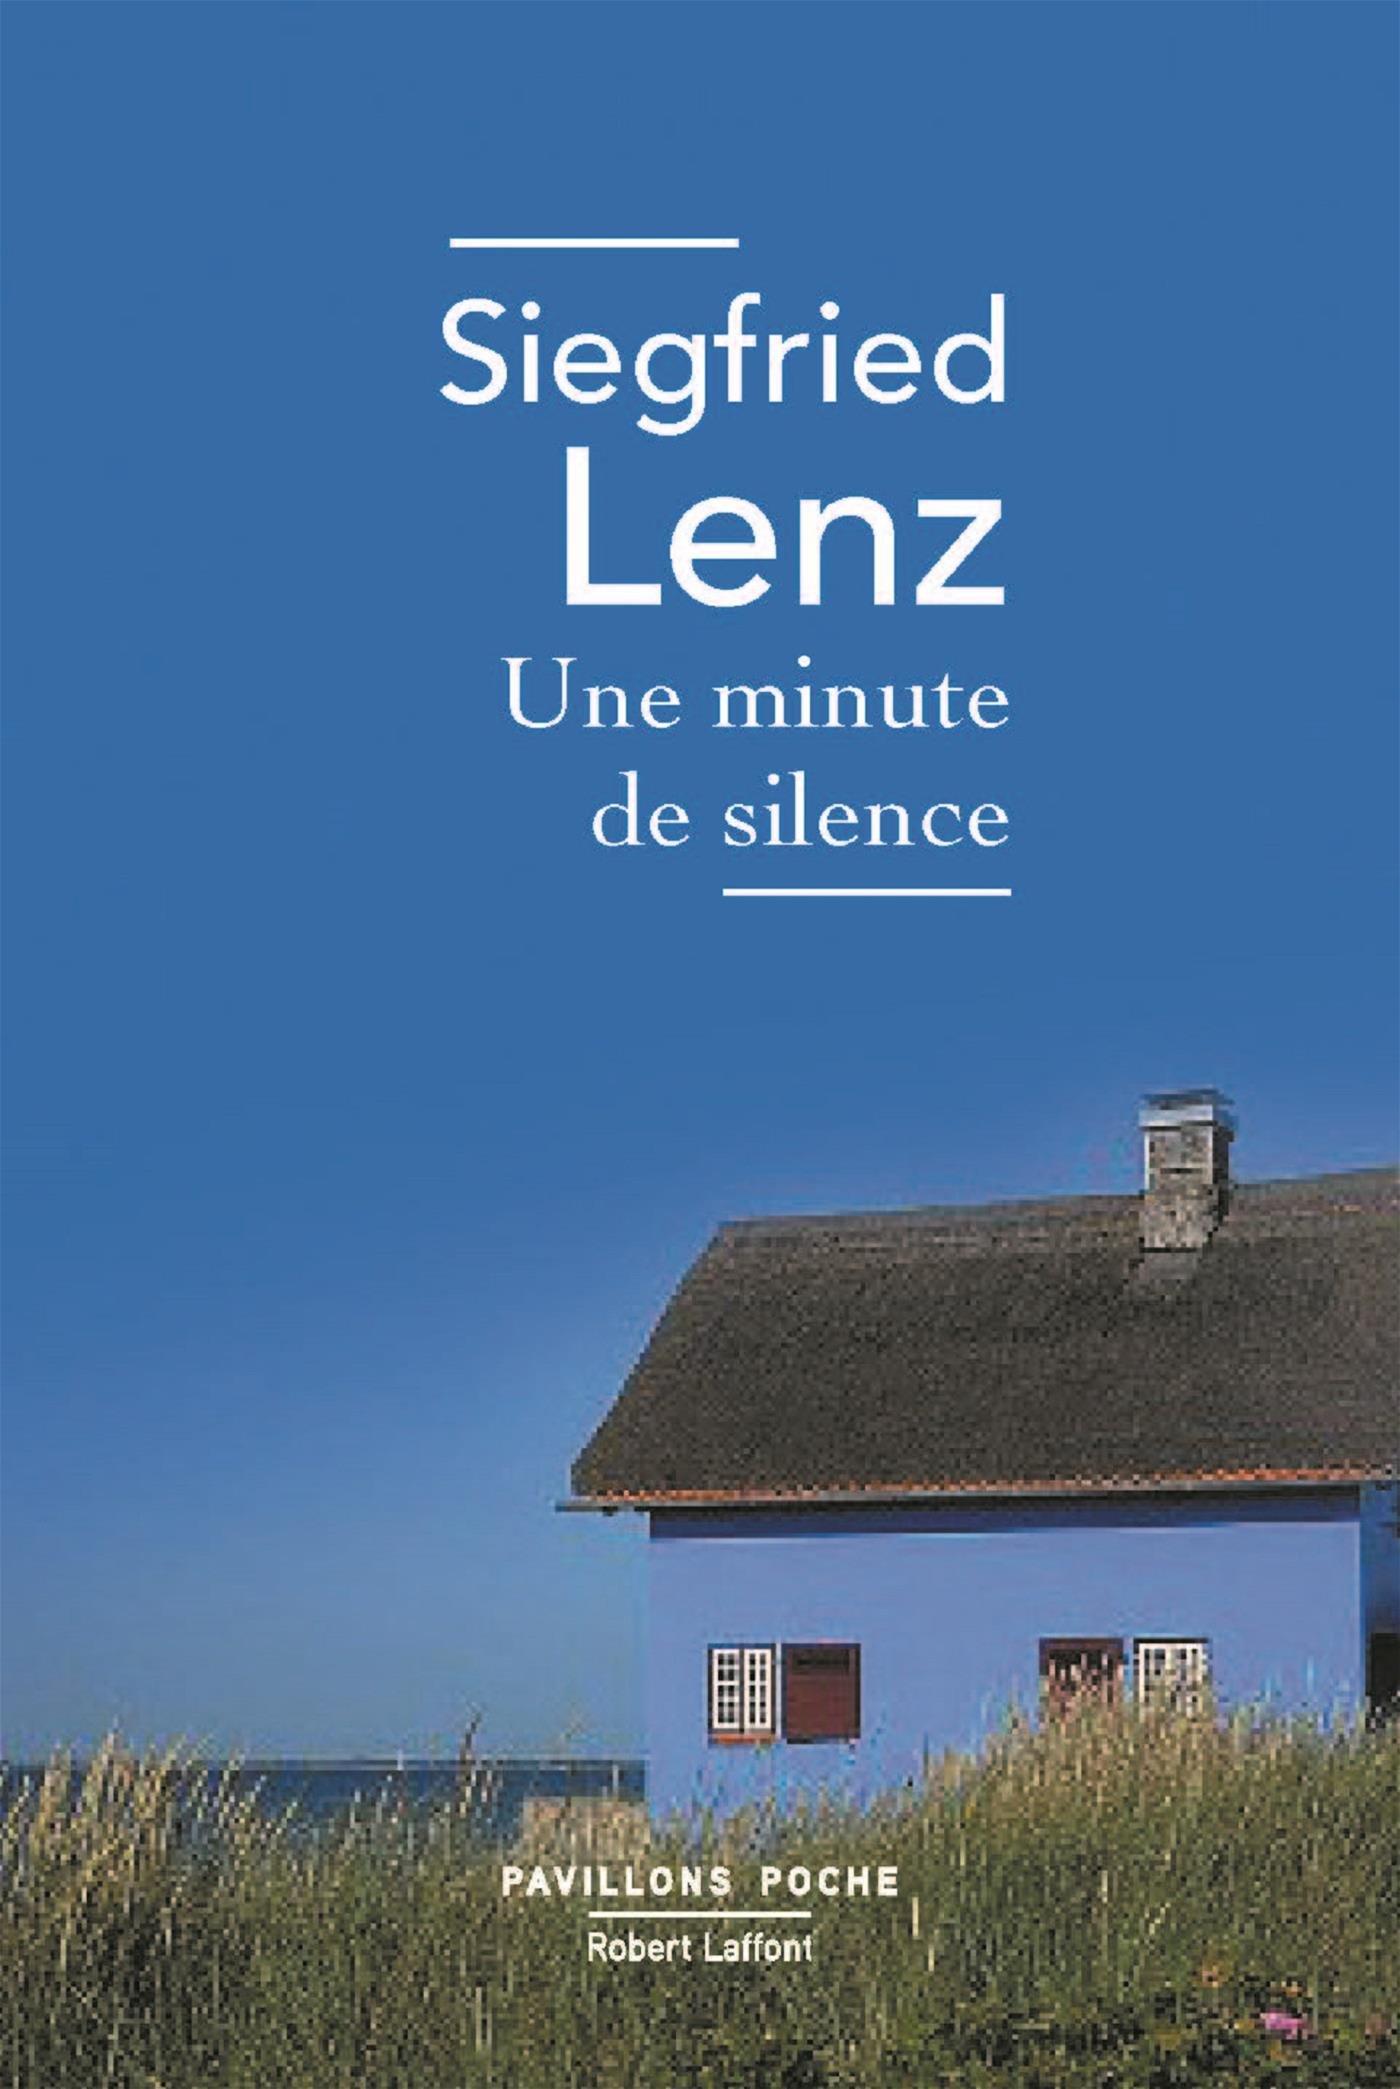 Une minute de silence de Siegfried Lenz